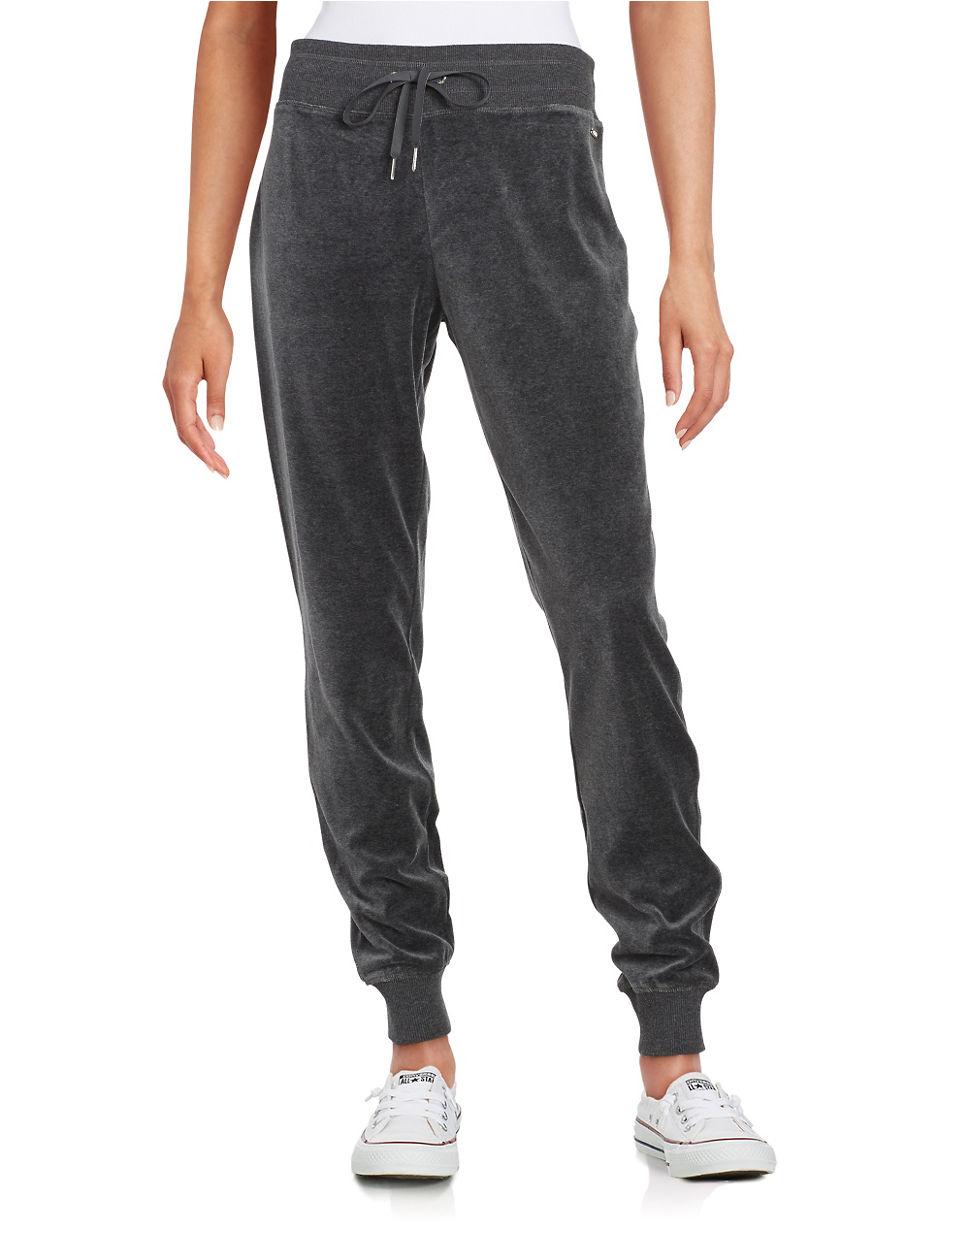 Black Stretch Jeans Womens